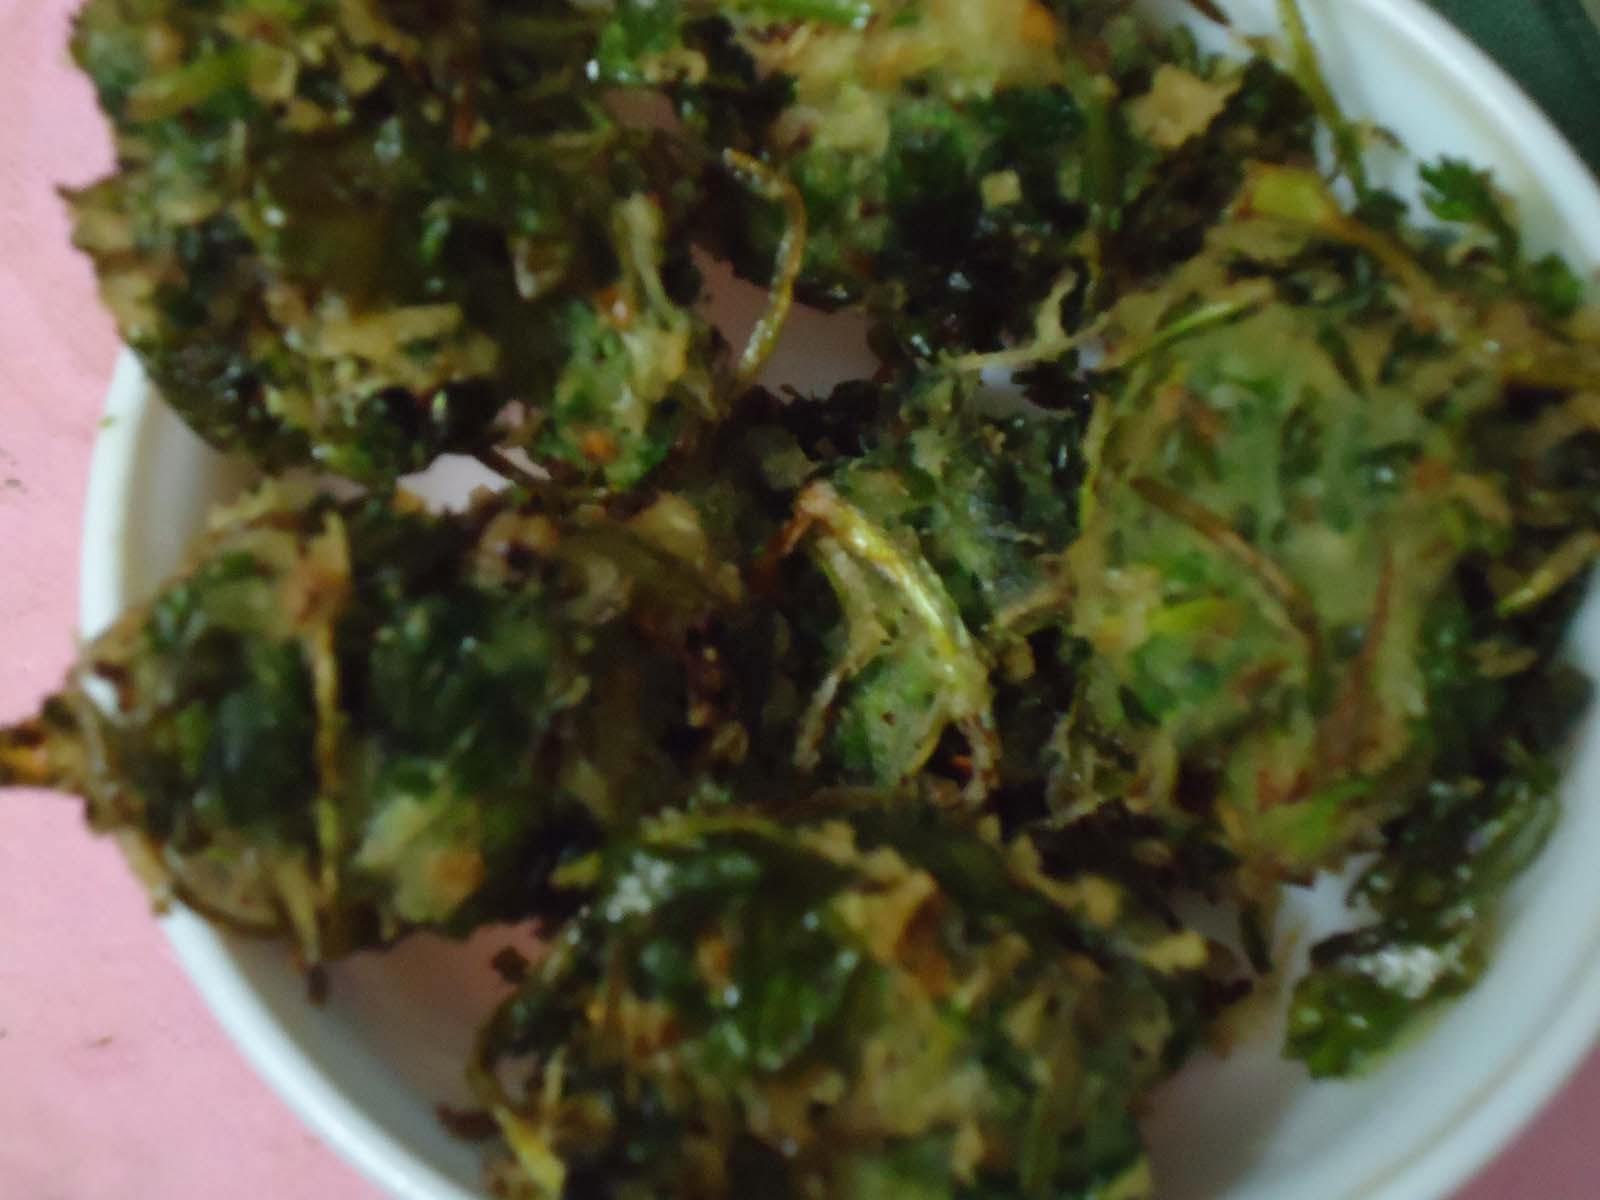 Dhone patar bora - Coriander leaves fry